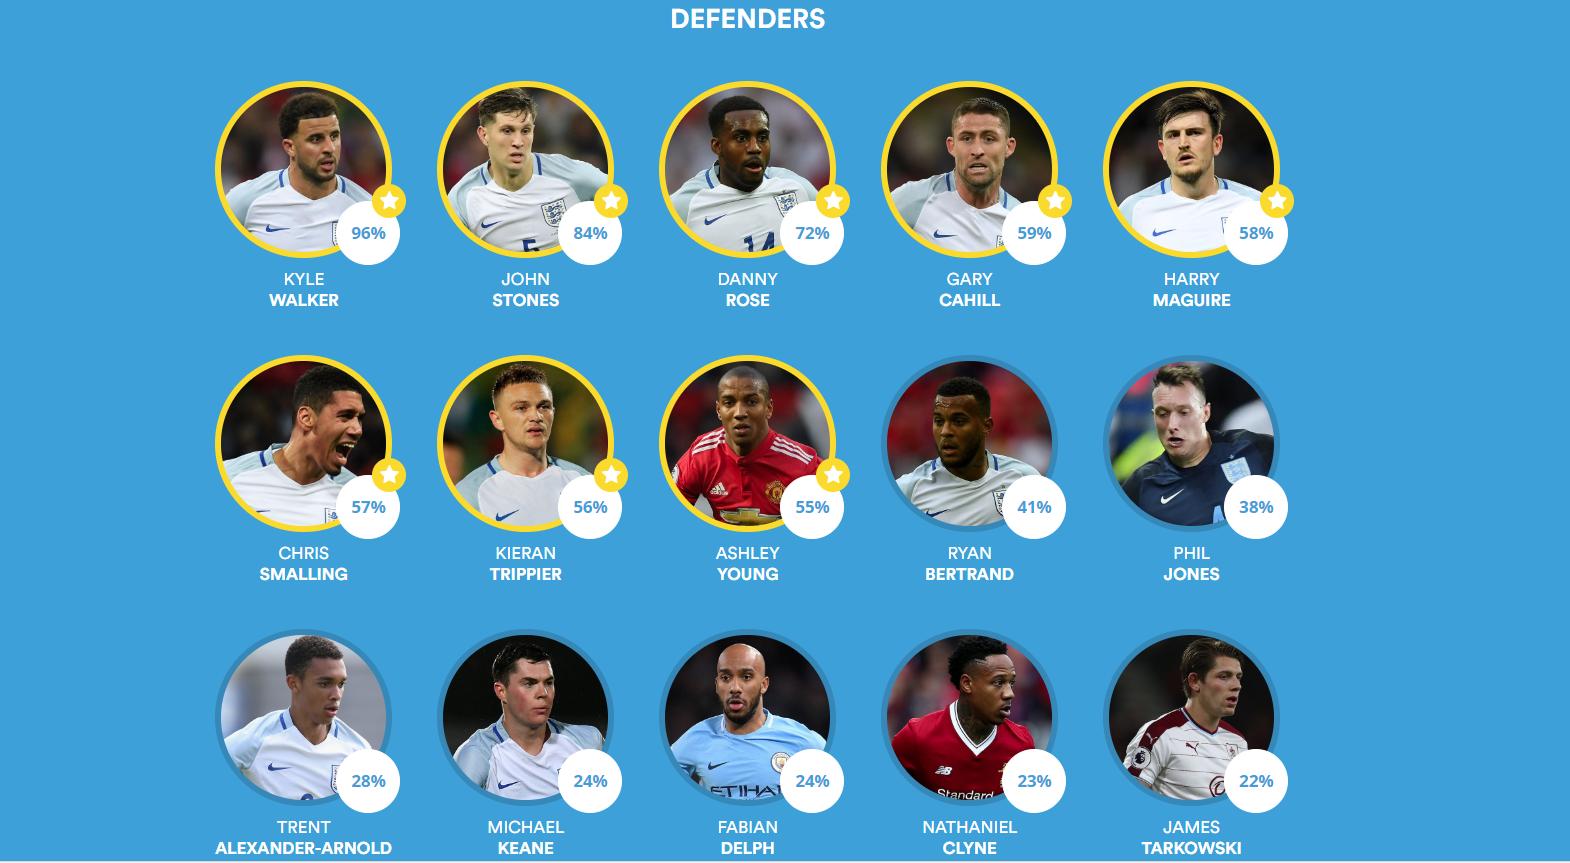 BBC - Association football defenders